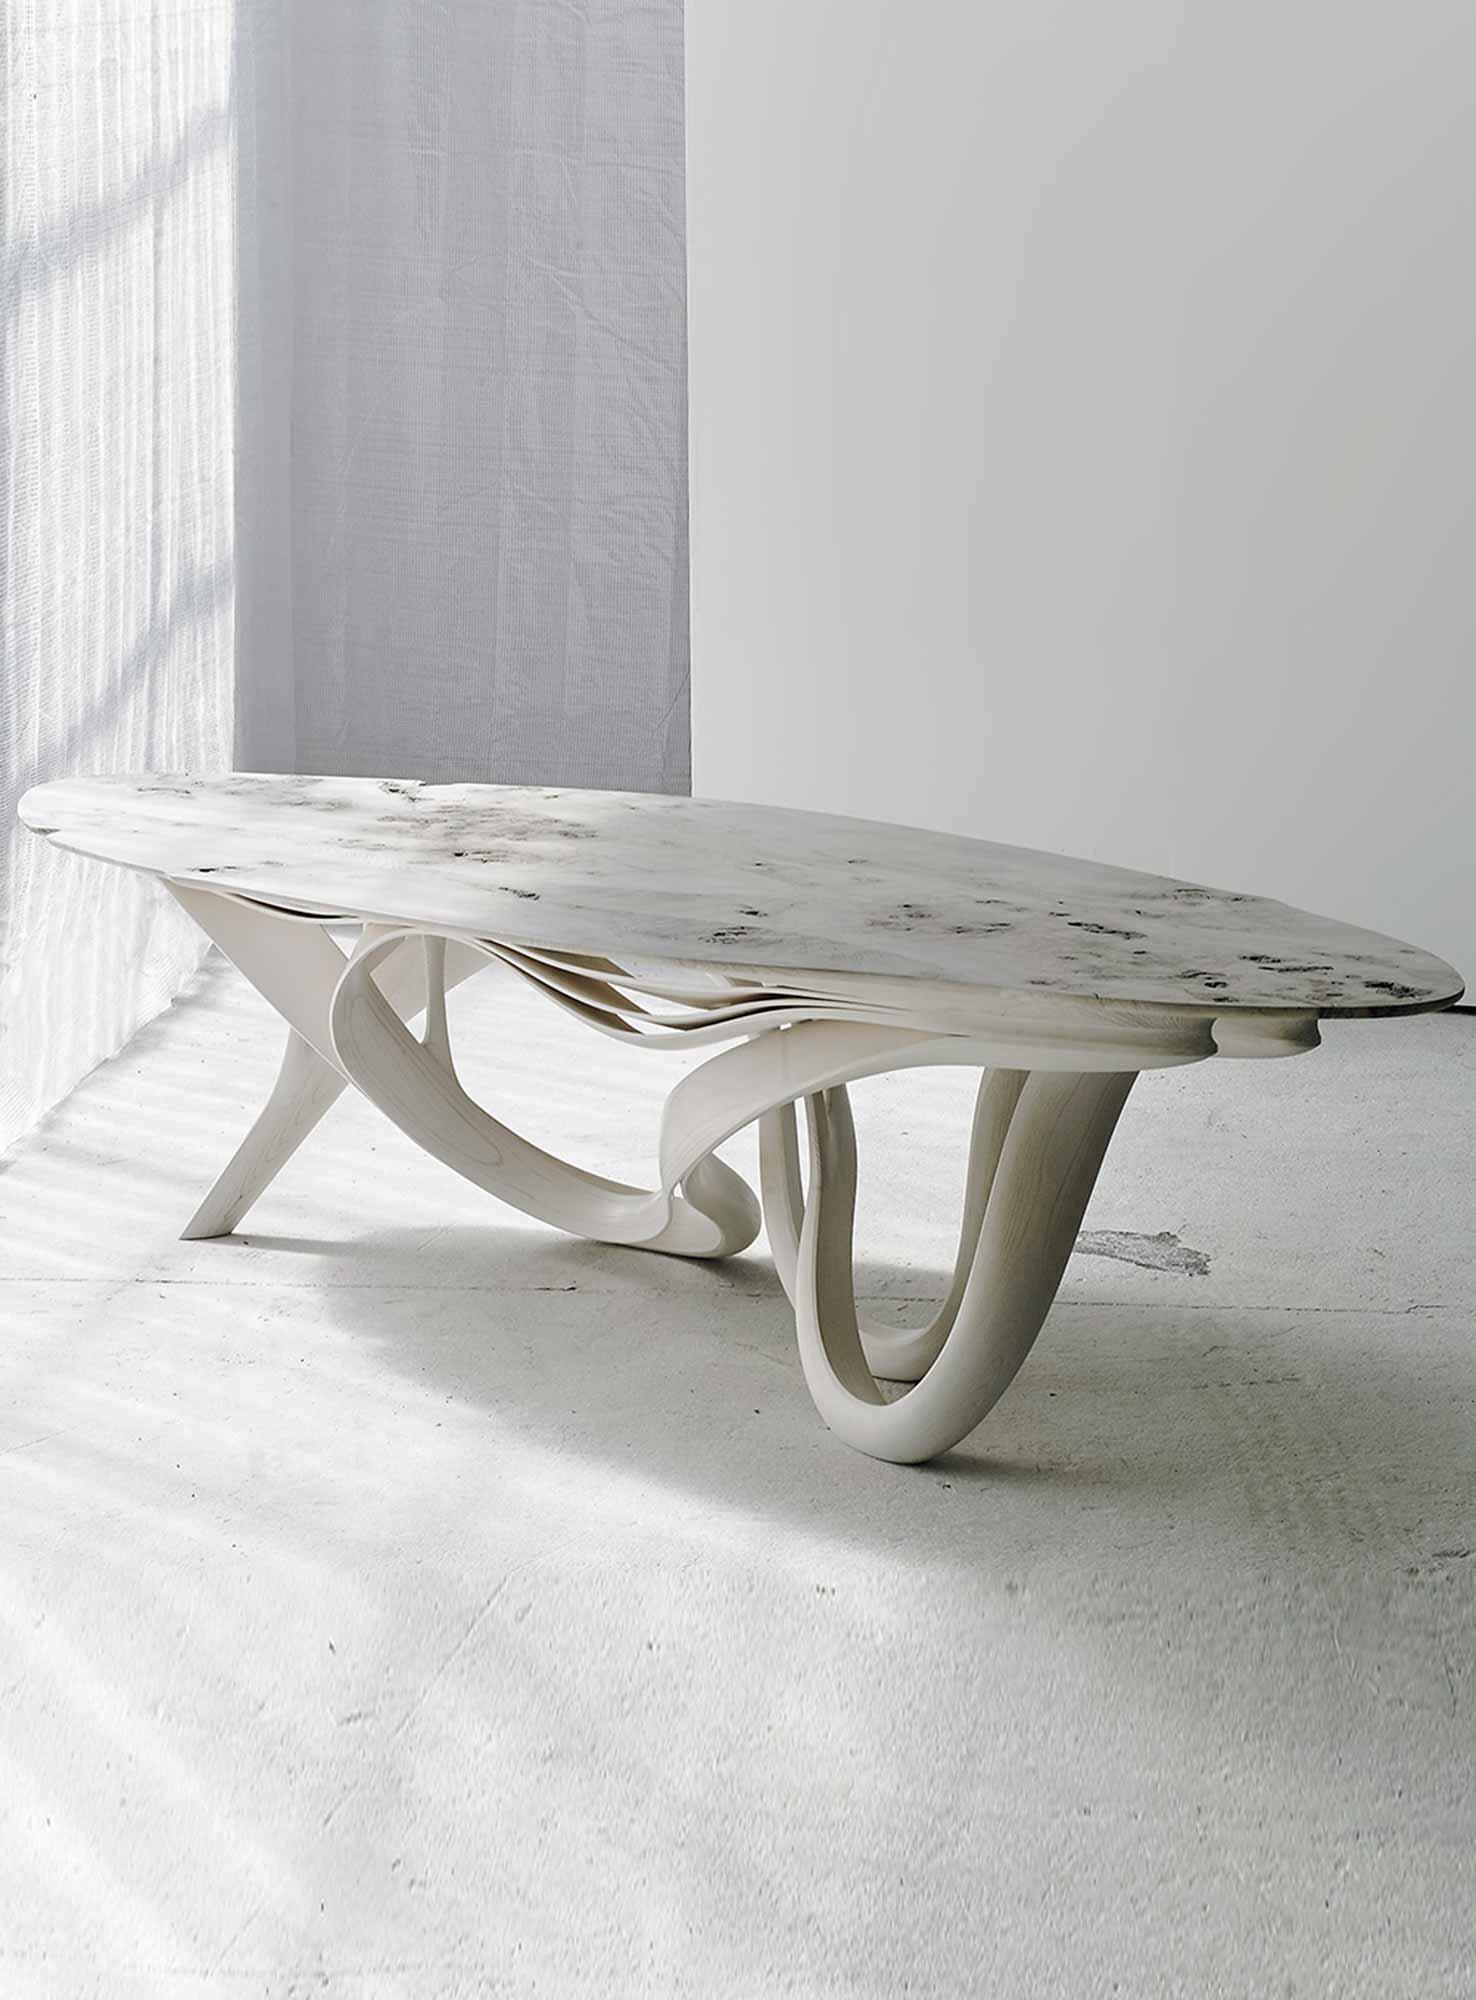 Rinn Enignum Dining Table(2018)